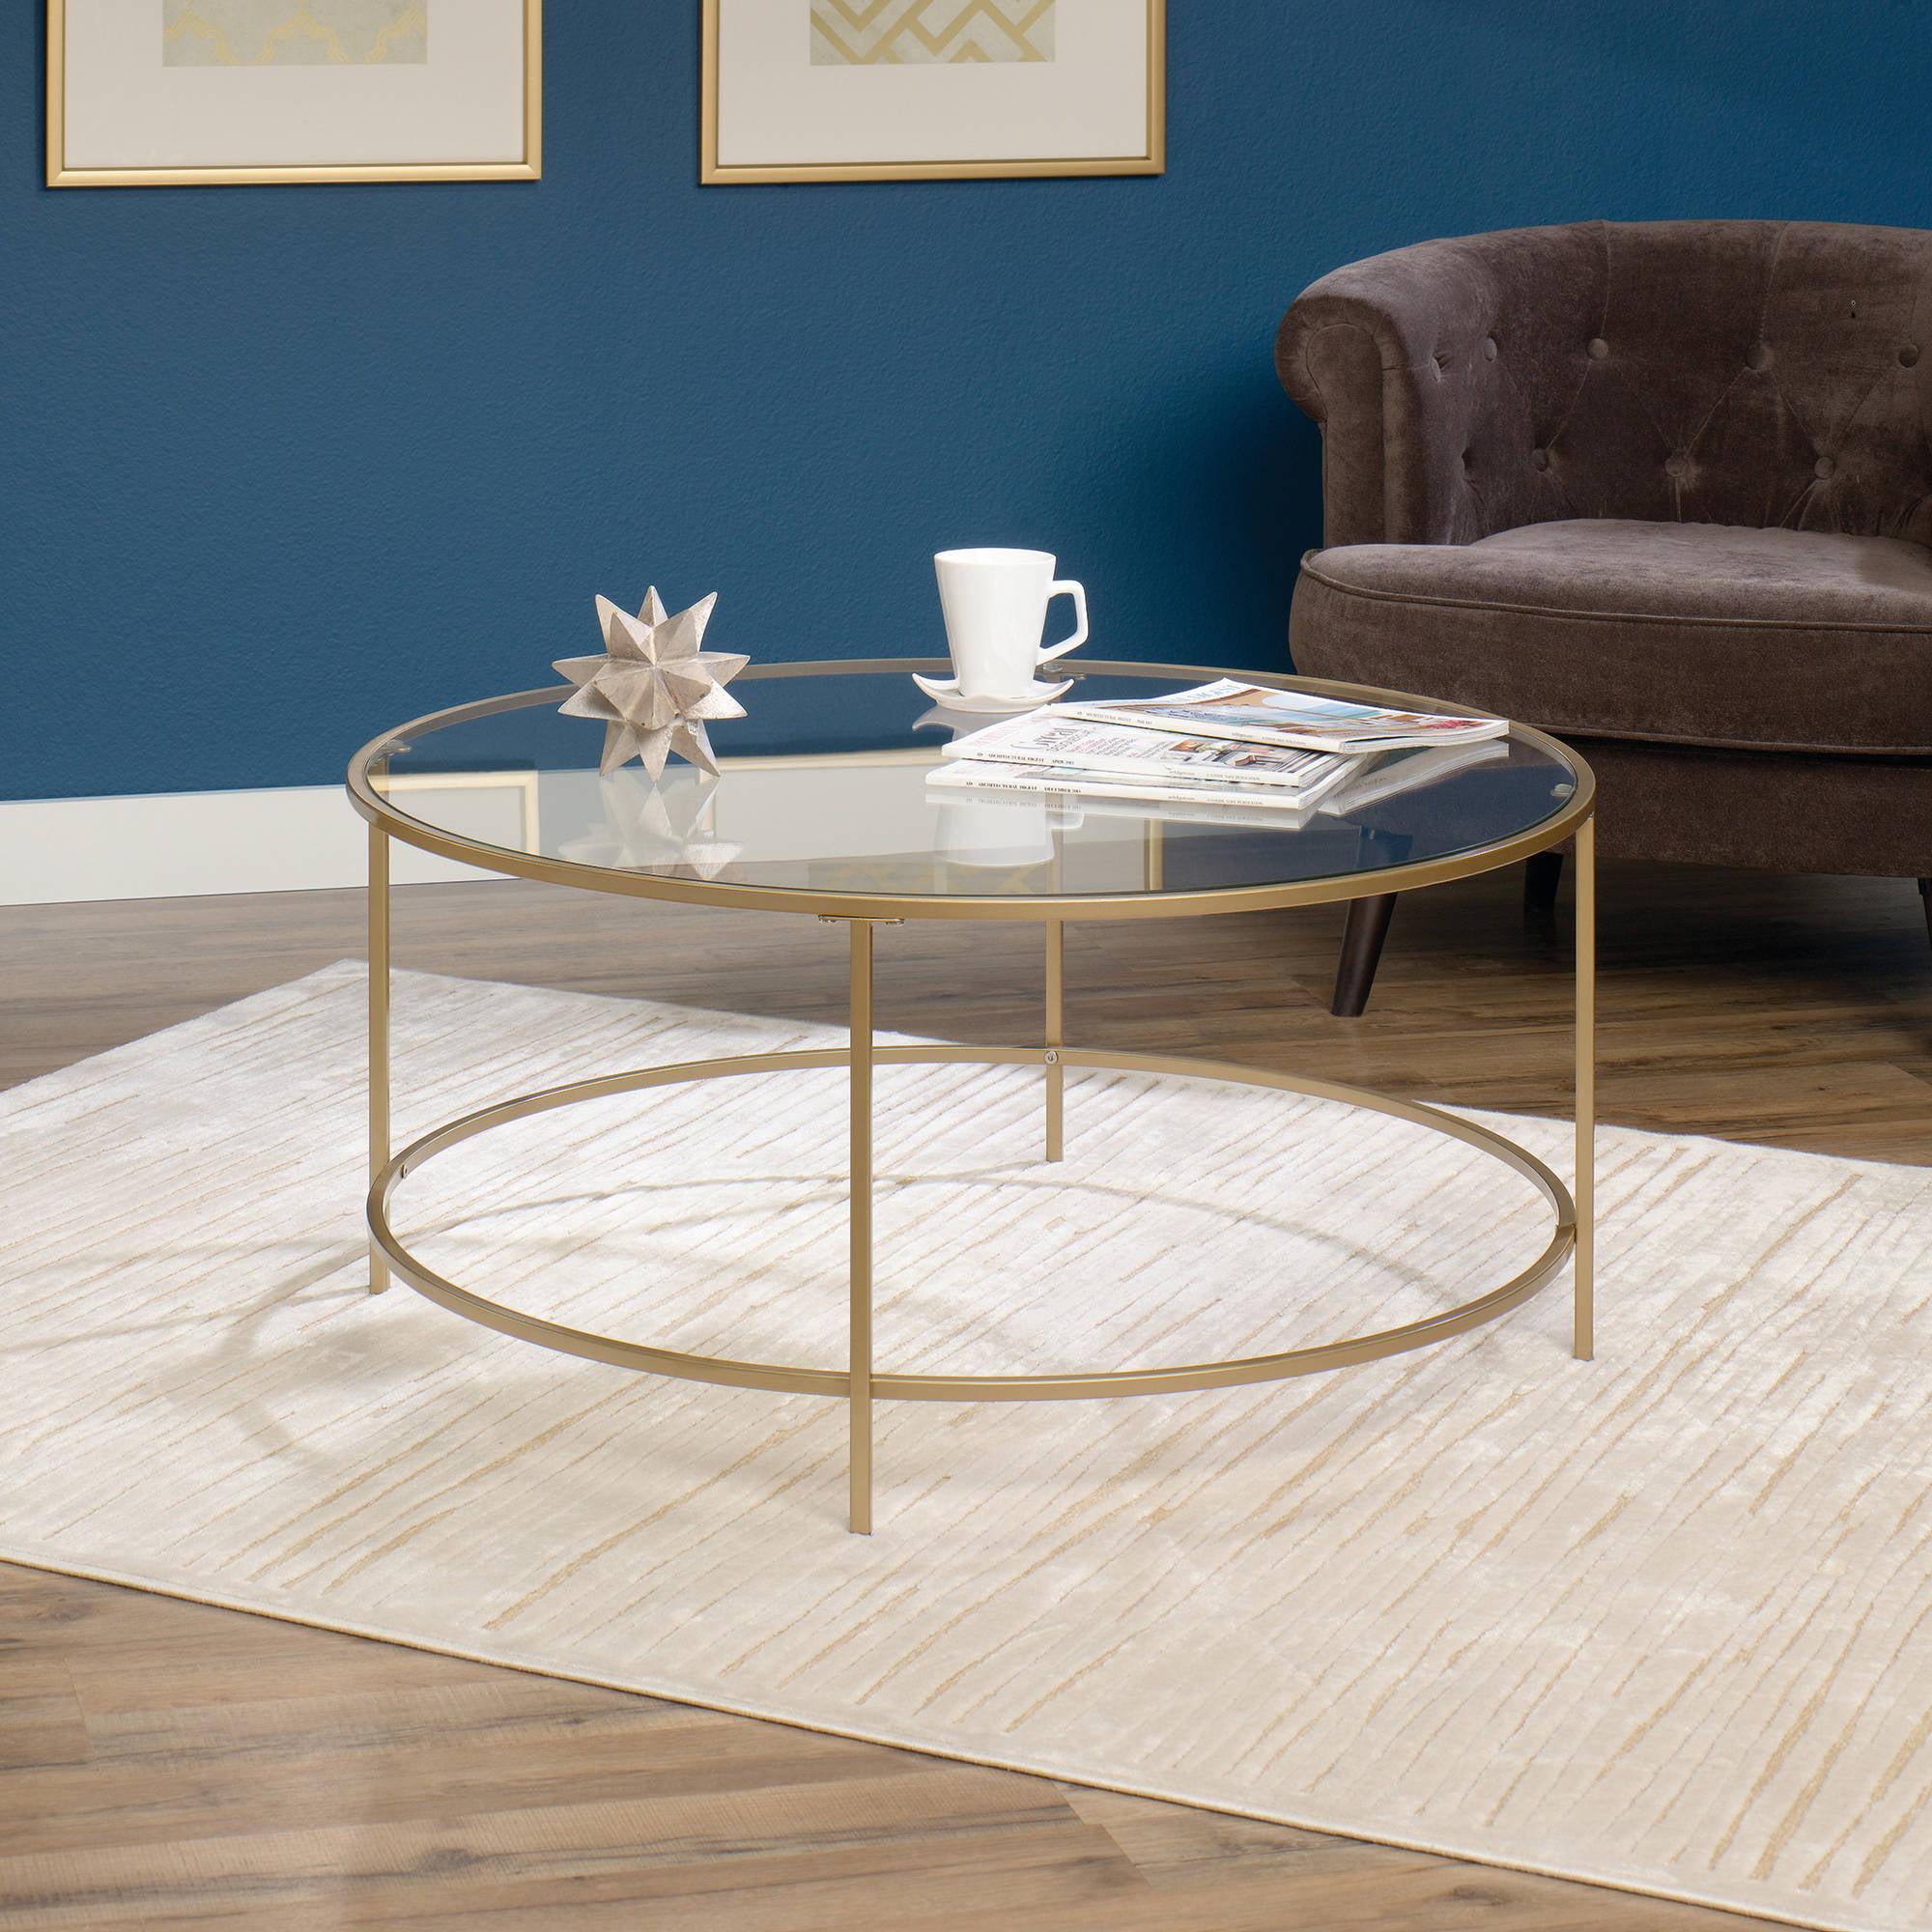 Sauder International Lux Round Coffee Table, Satin Gold